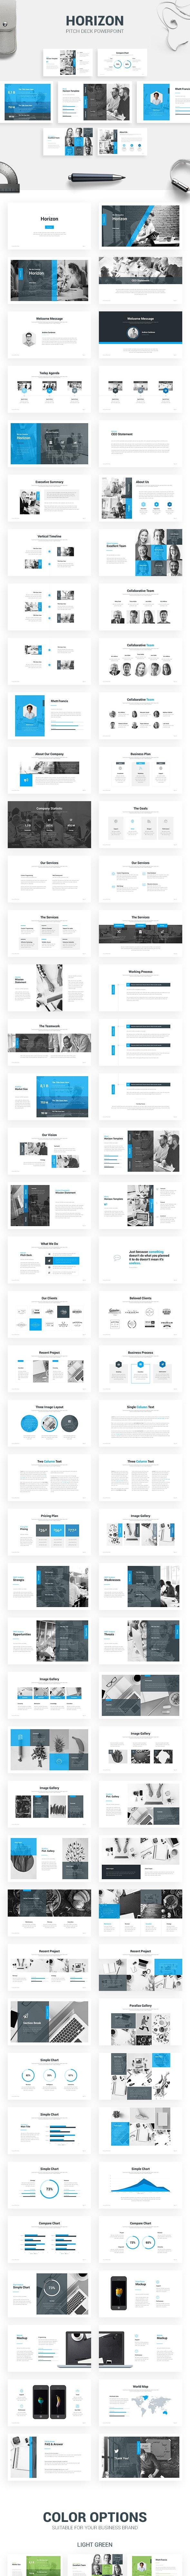 Horizon - Pitch Deck Template - Pitch Deck PowerPoint Templates